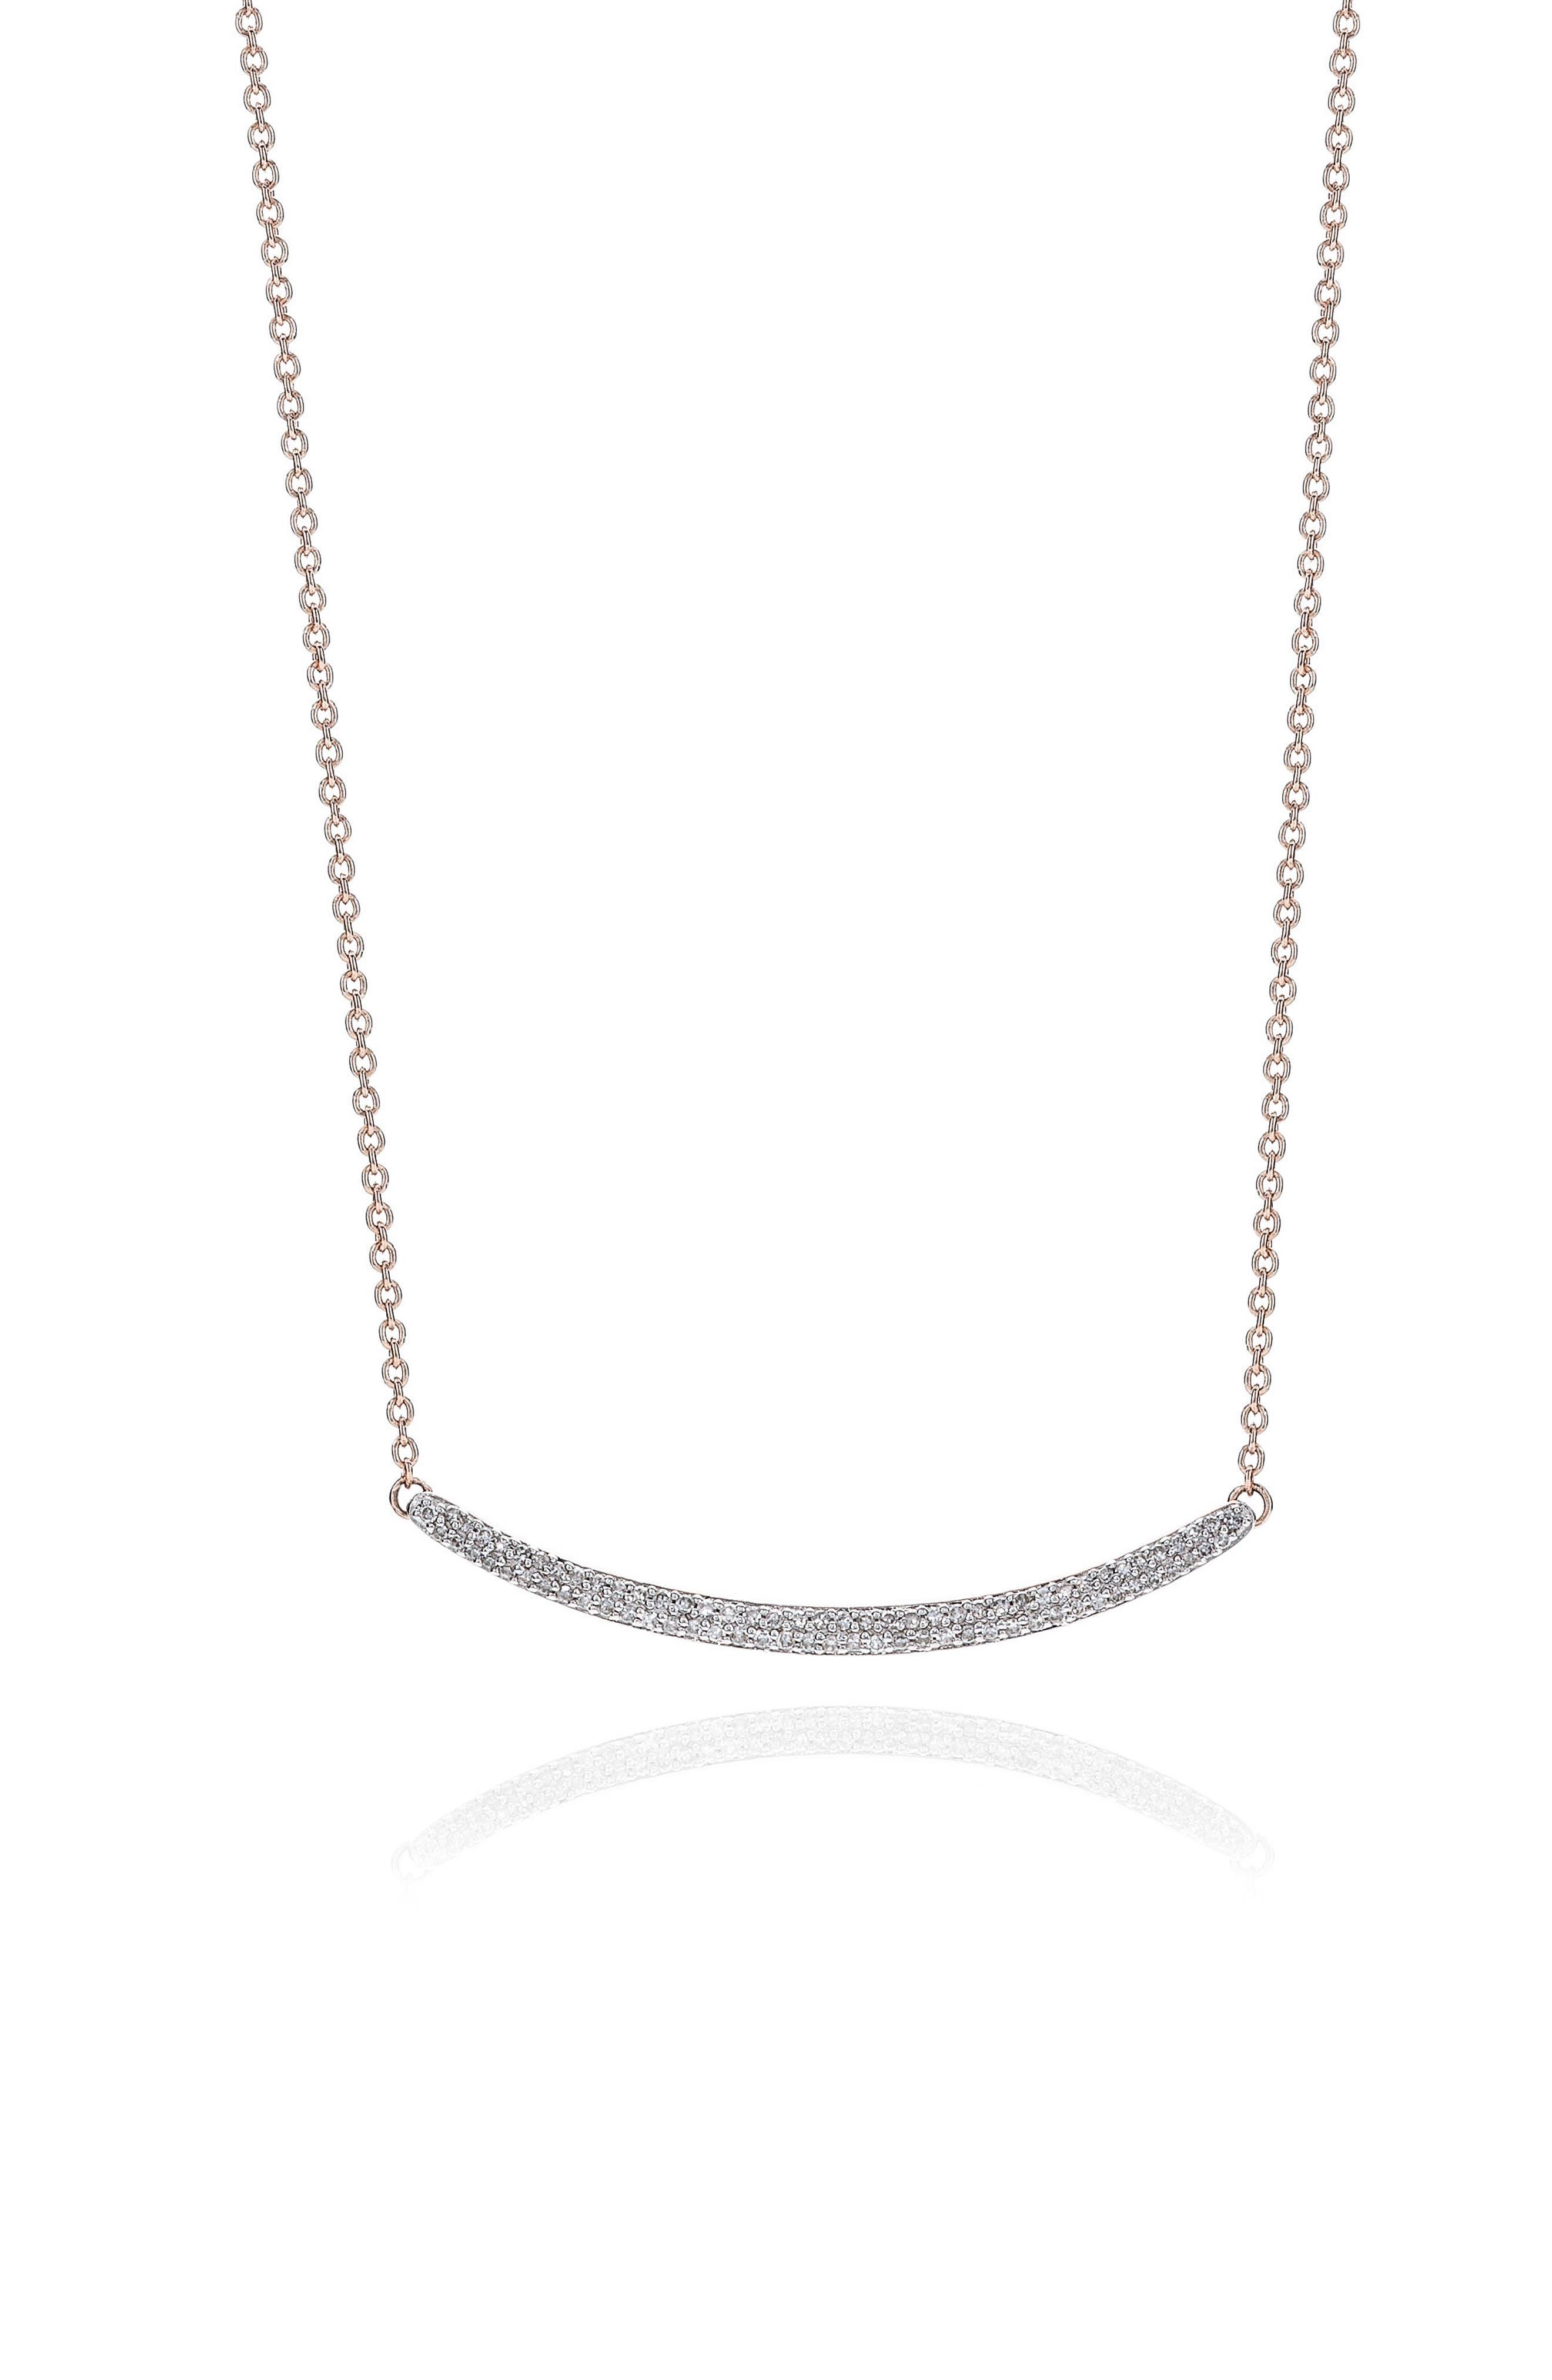 MONICA VINADER, Skinny Diamond Necklace, Main thumbnail 1, color, ROSE GOLD